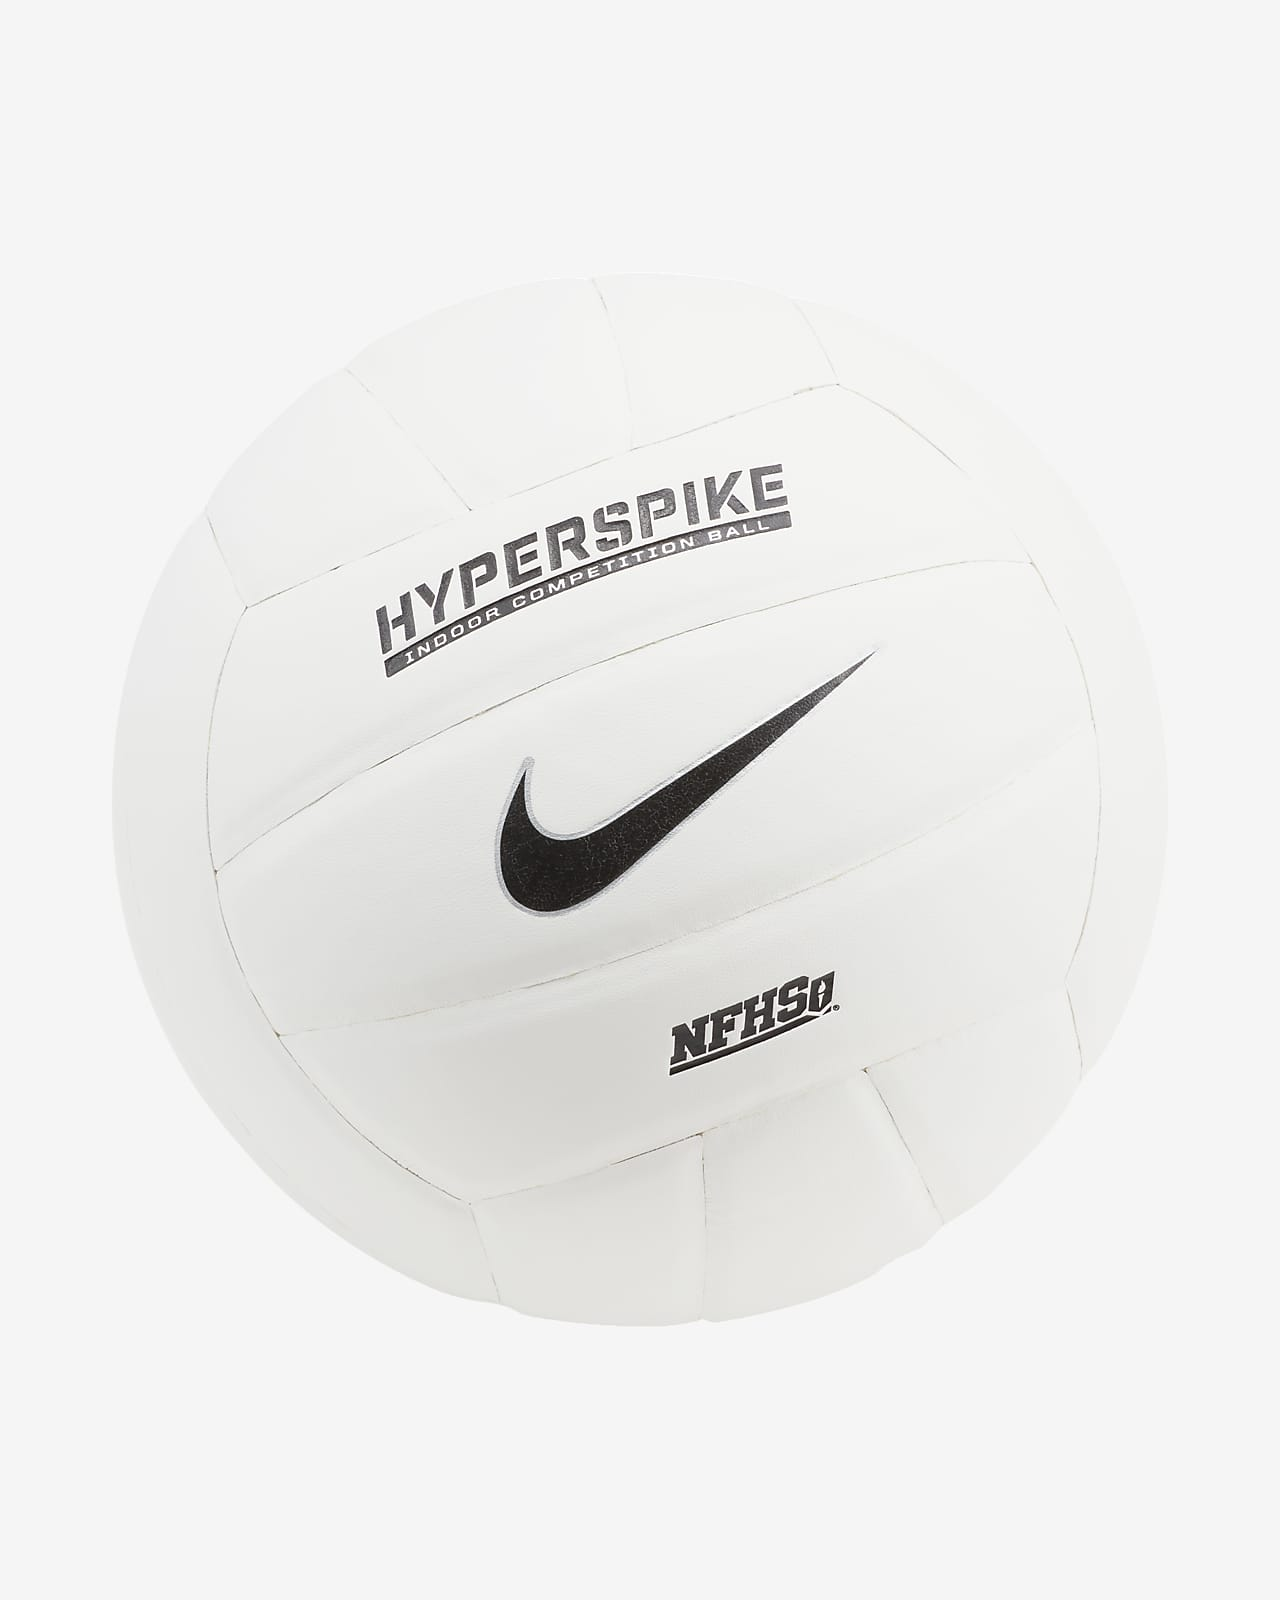 Balón de vóleibol Nike hyperspike 18P